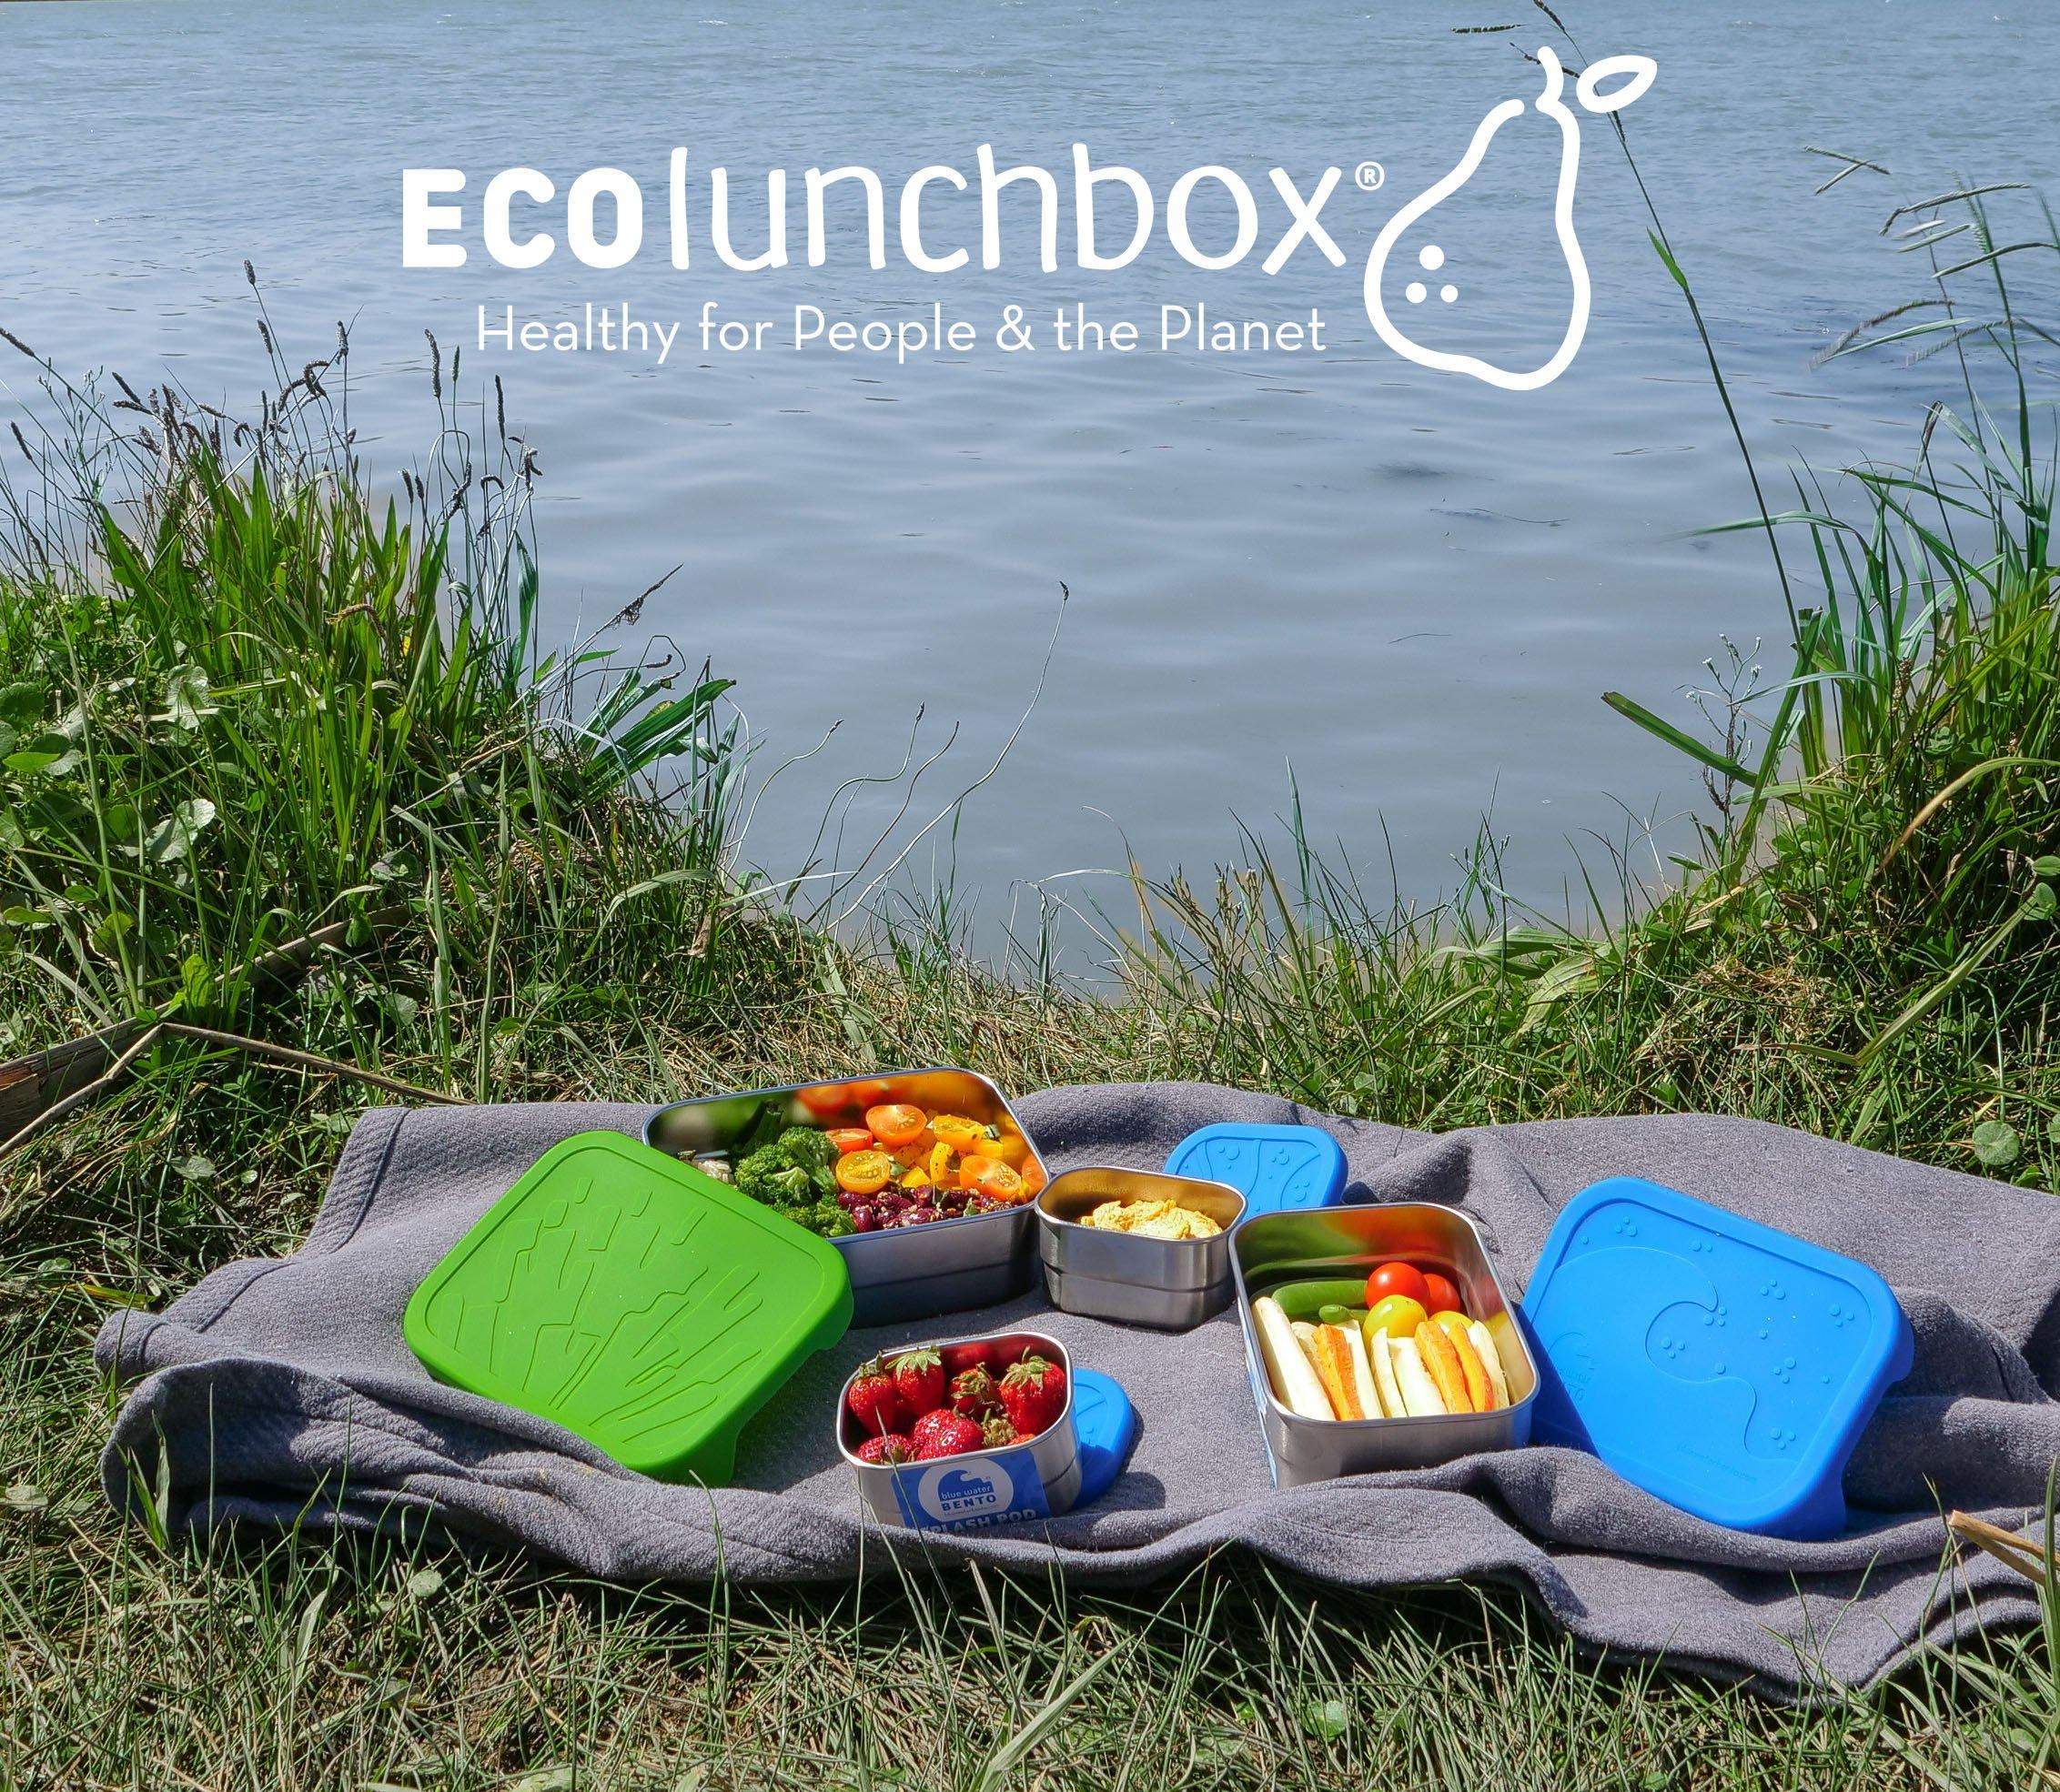 ECOlunchbox